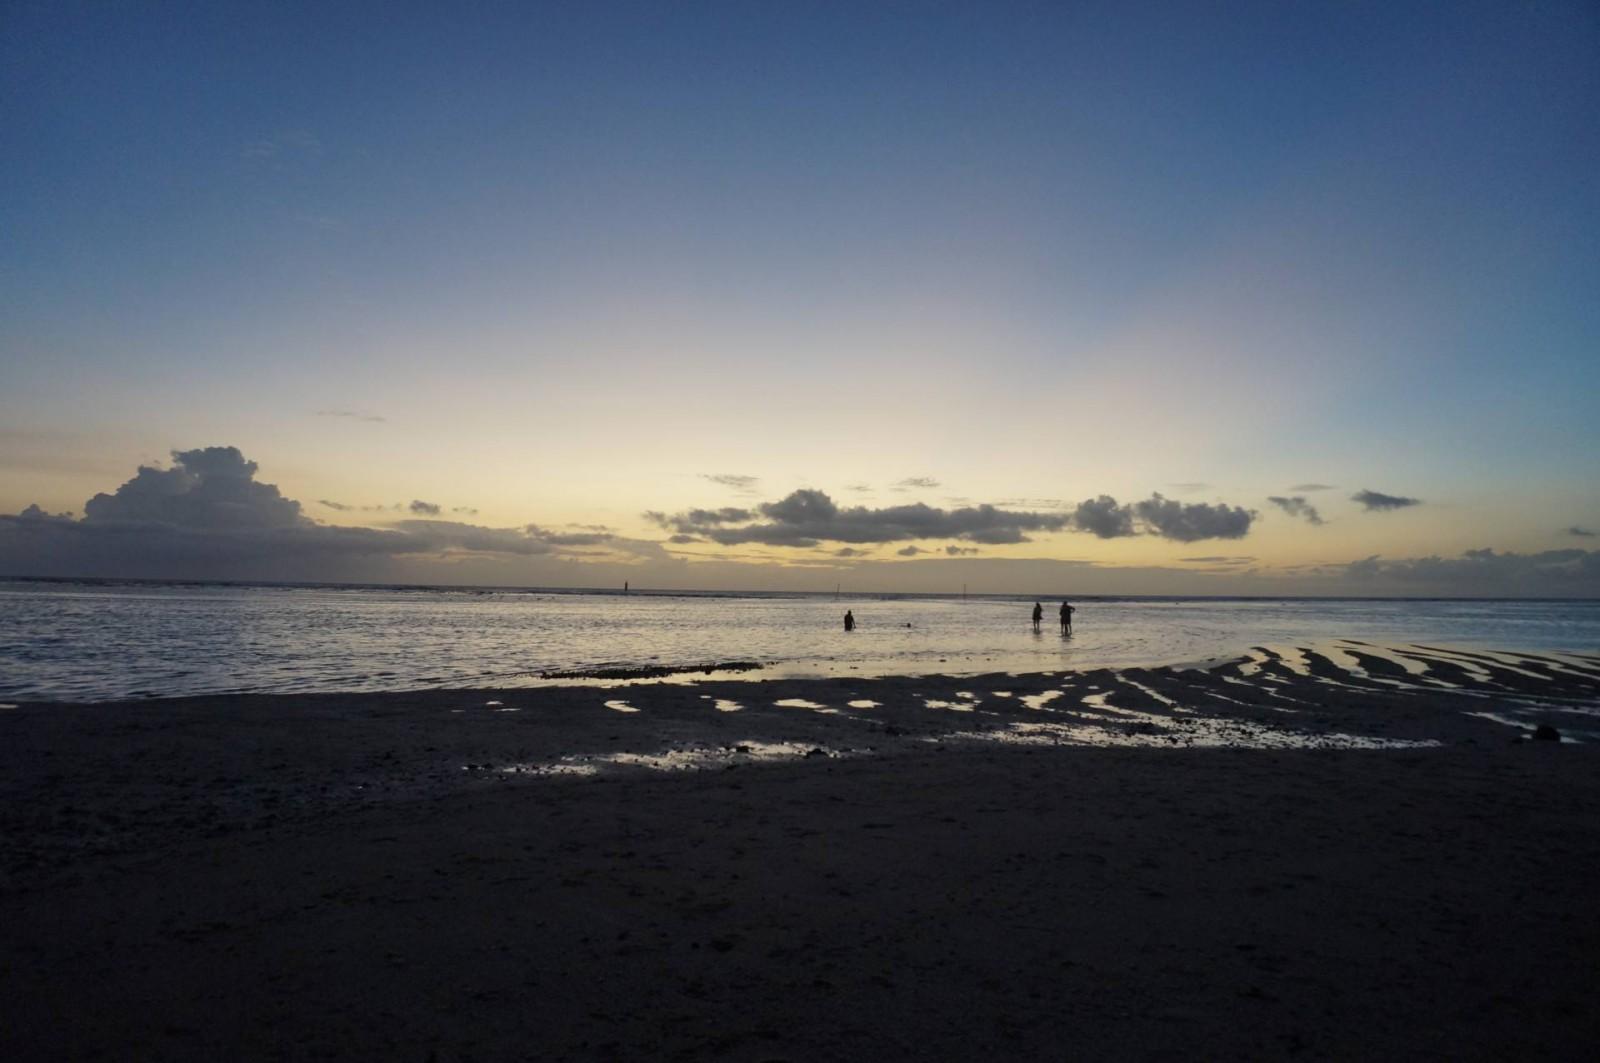 SUNSET AU COCO BEACH